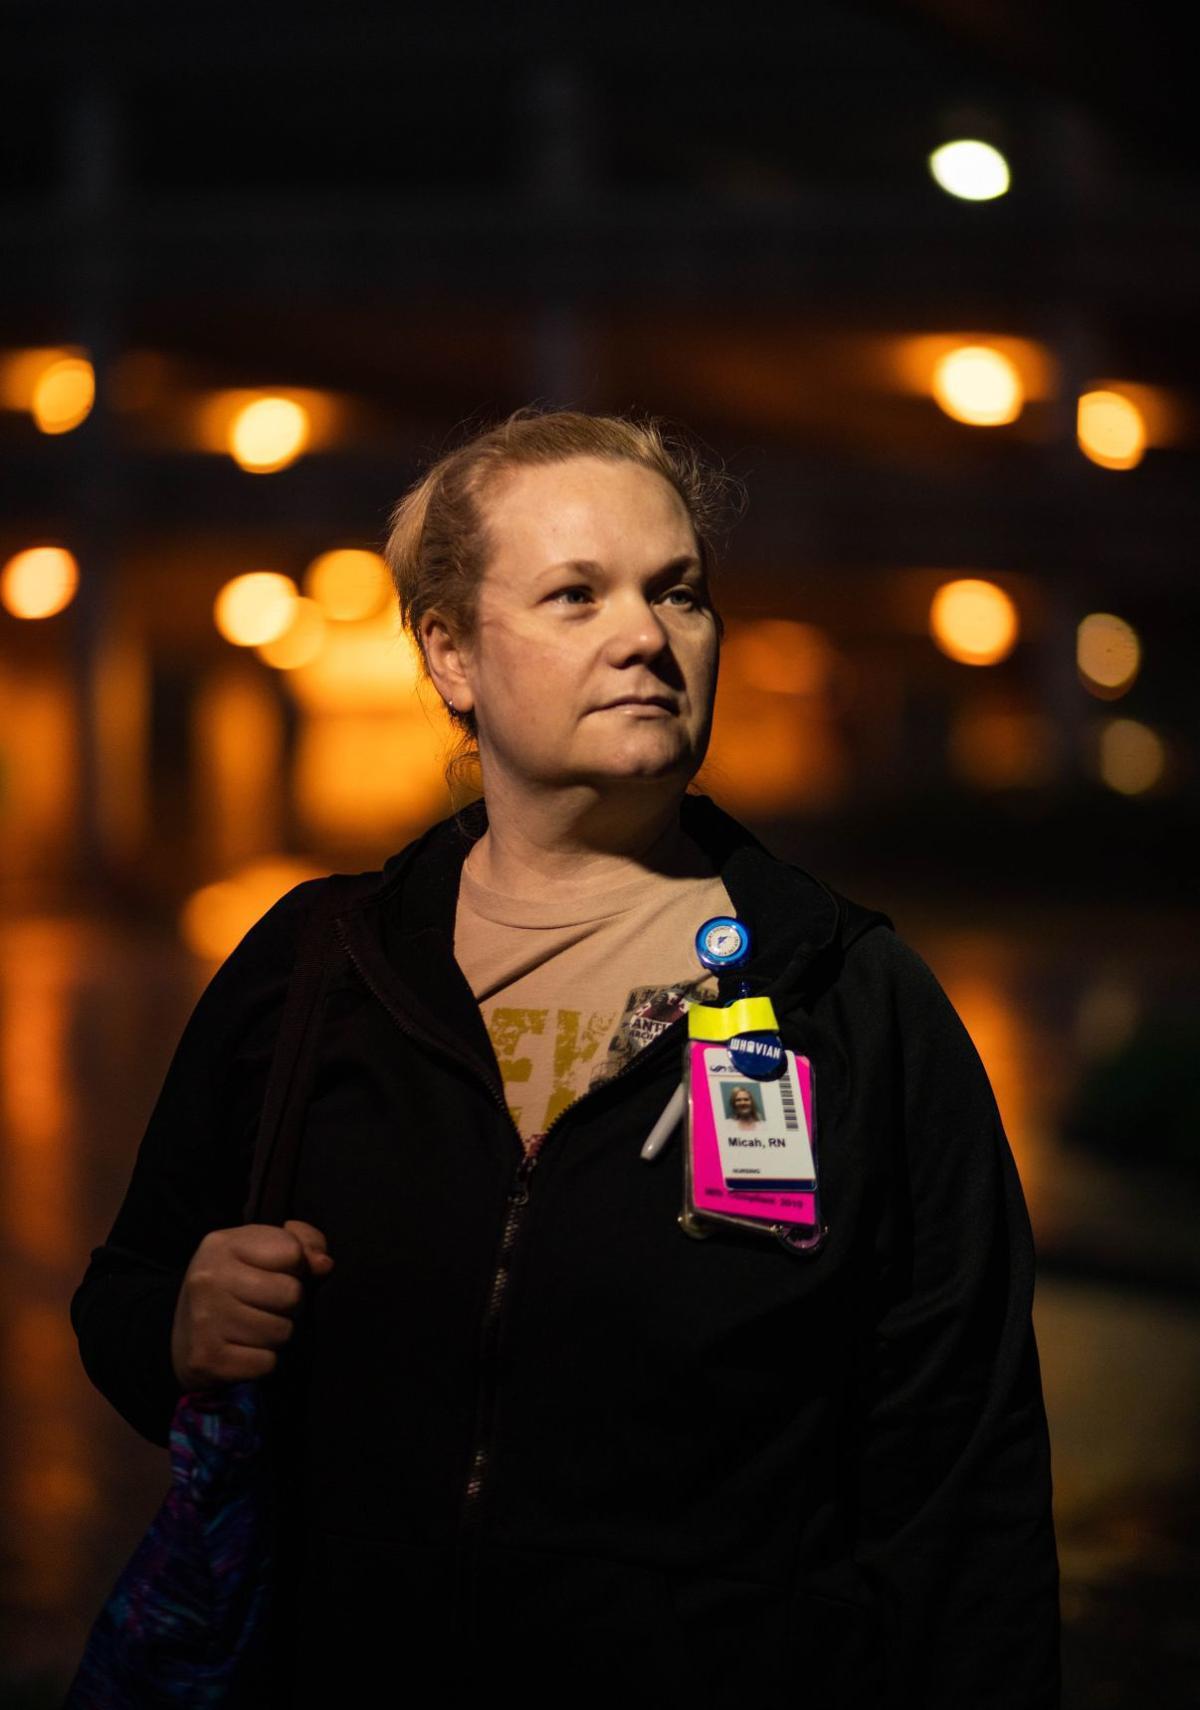 Nurses remain on the frontlines during coronavirus peak in St. Louis